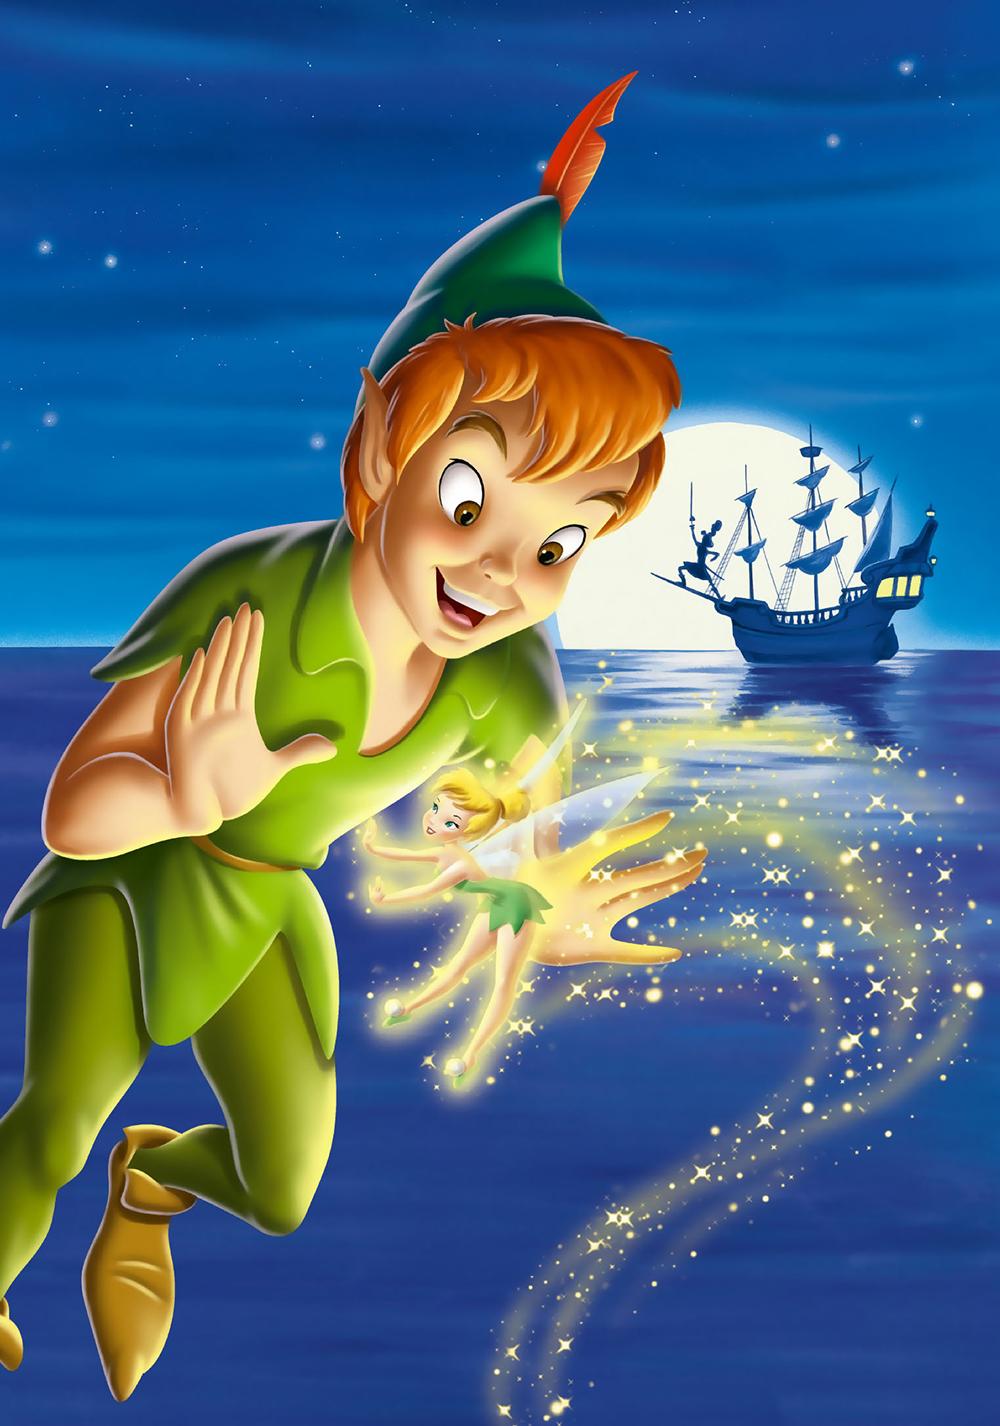 Peter pan movie fanart - Image de peter pan ...